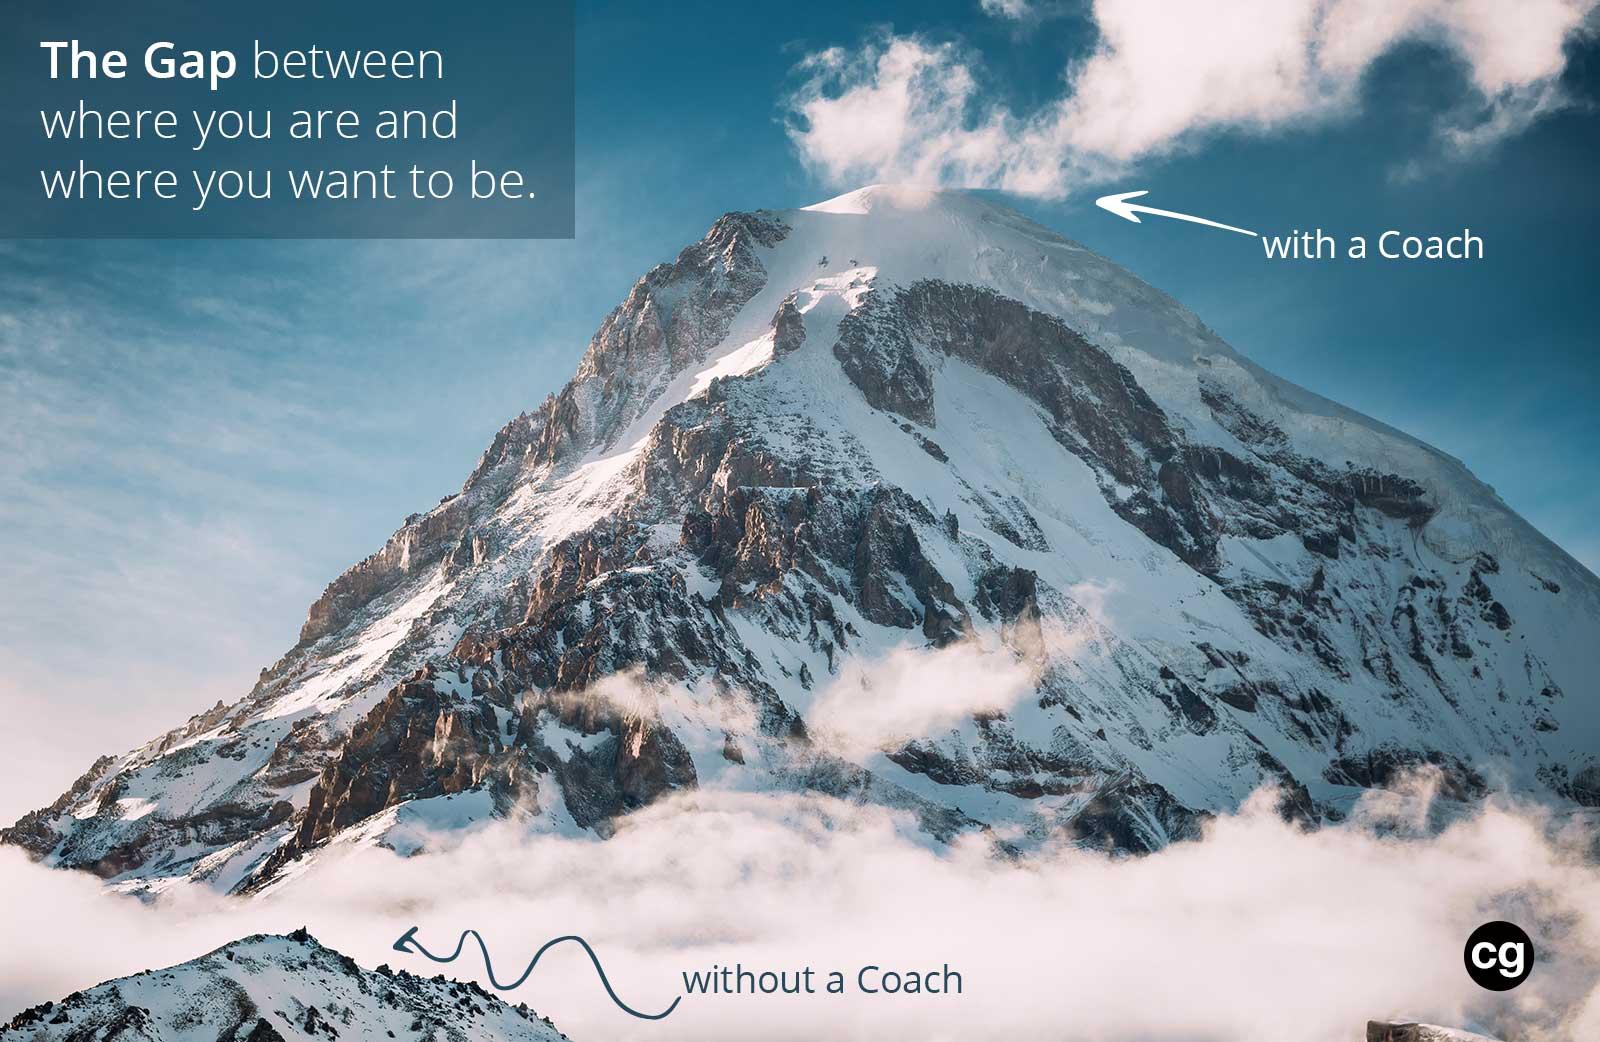 coach cg the gap move forward